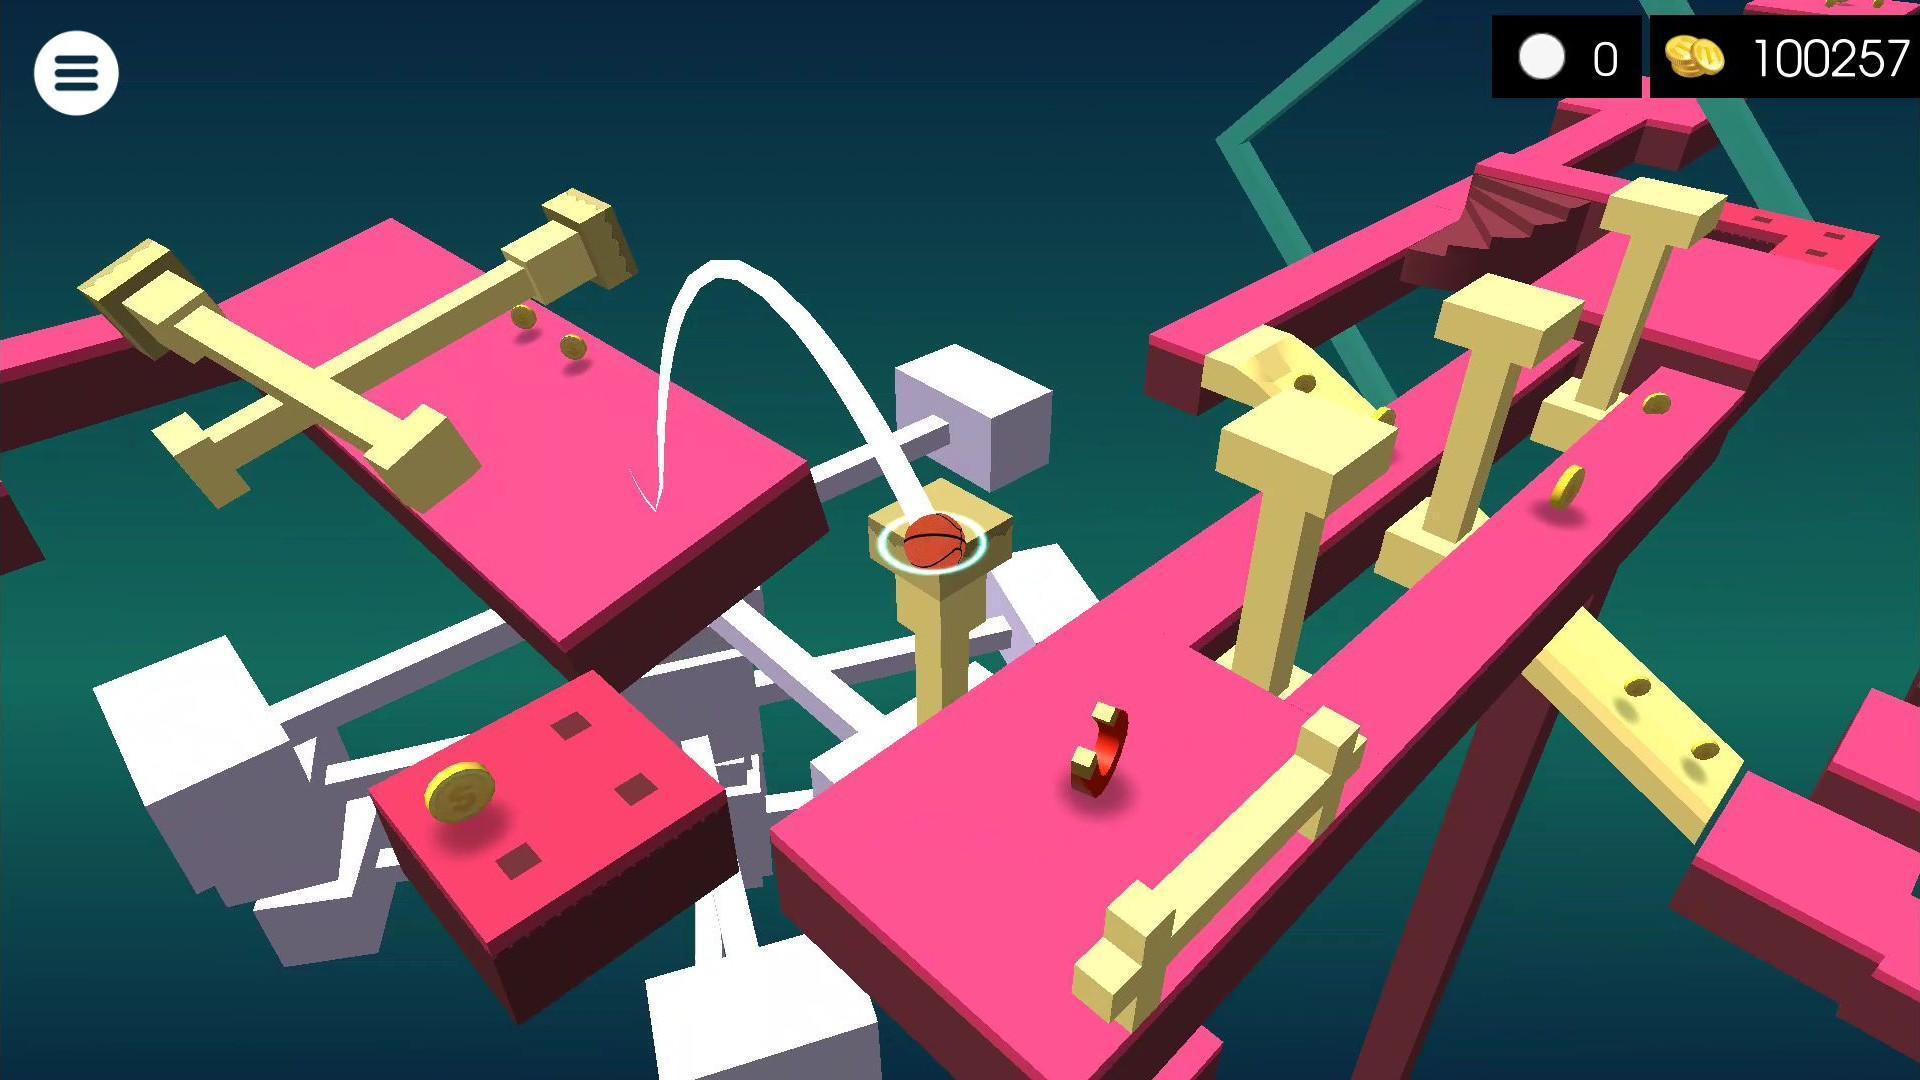 RYWO free 3D roll ball game 1.2.3 Screenshot 1